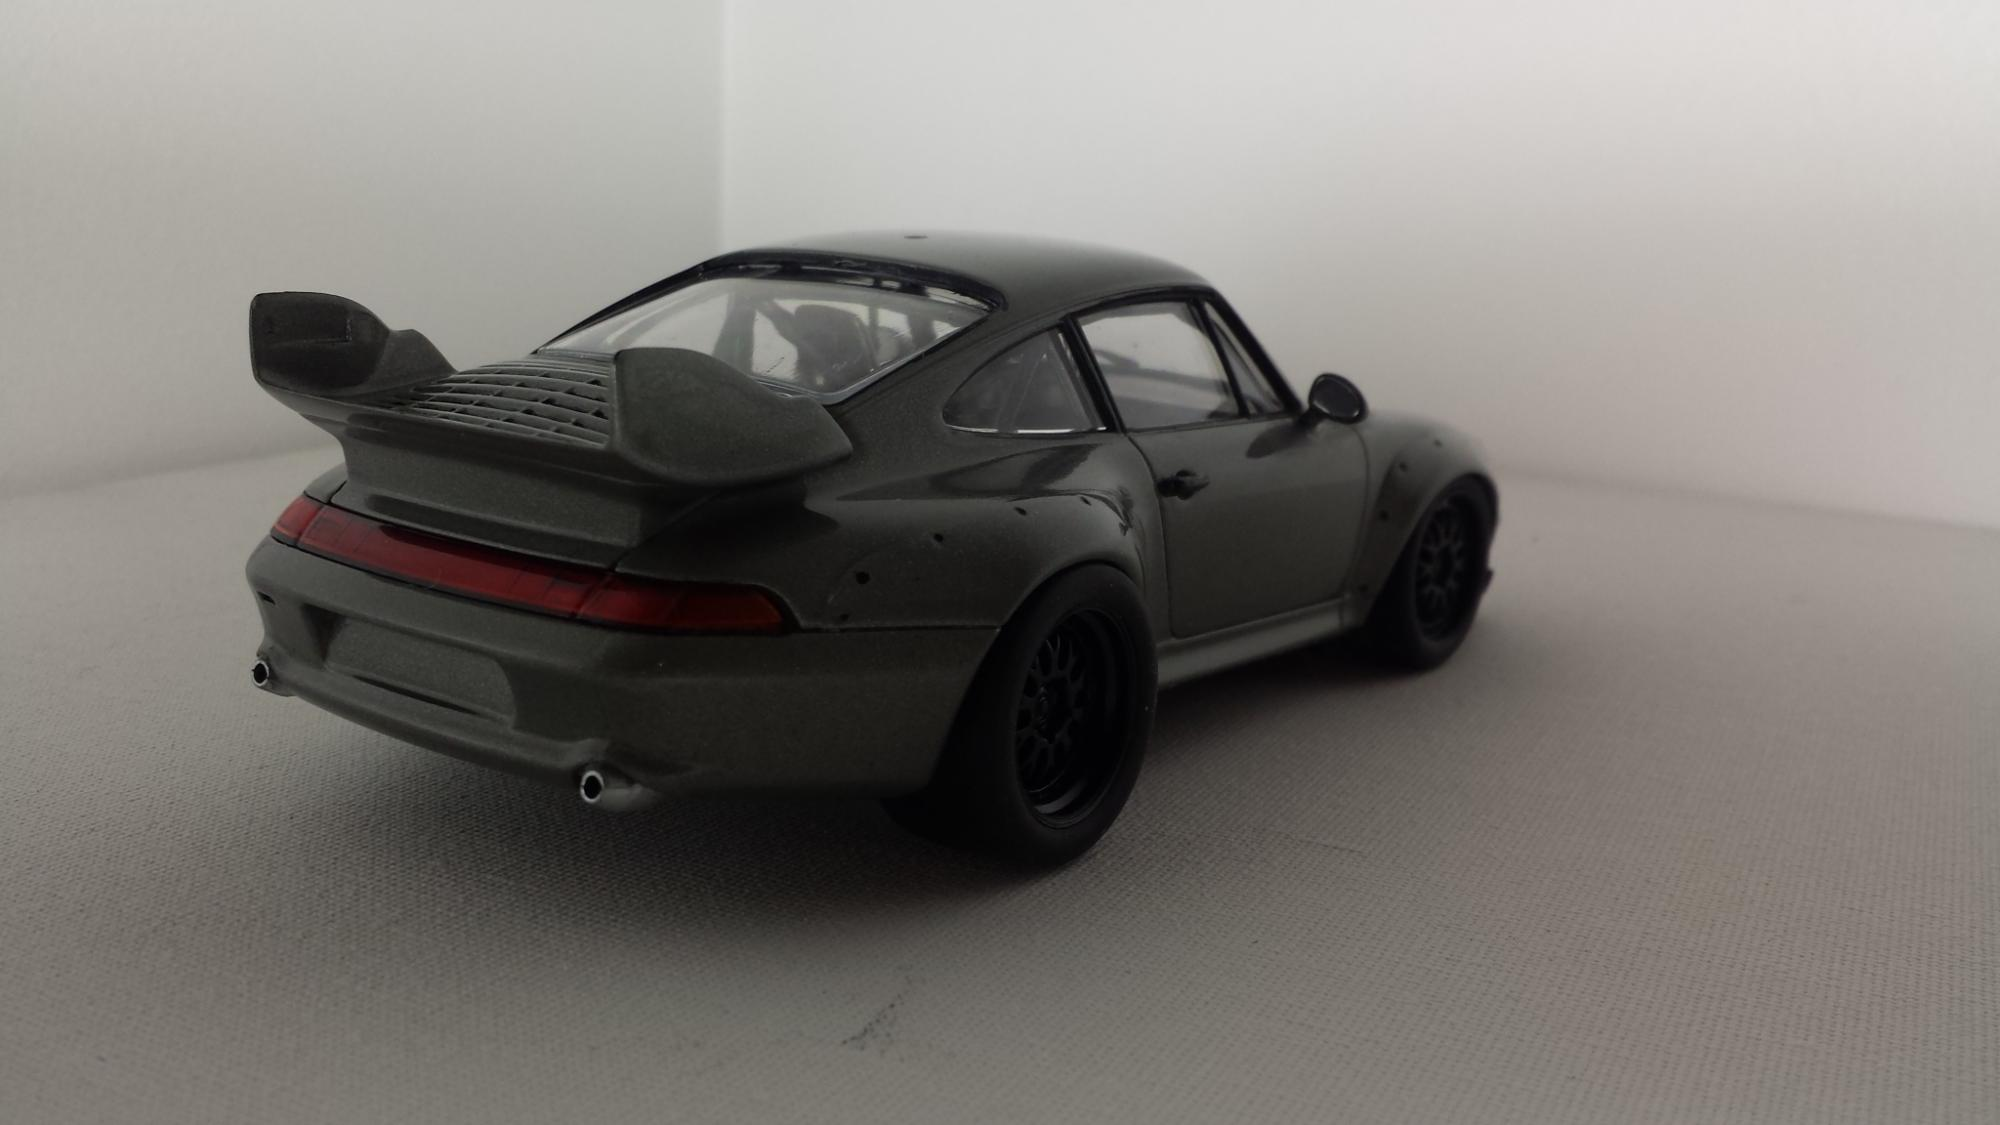 tamiya porsche 911 gt2 under glass model cars magazine forum. Black Bedroom Furniture Sets. Home Design Ideas